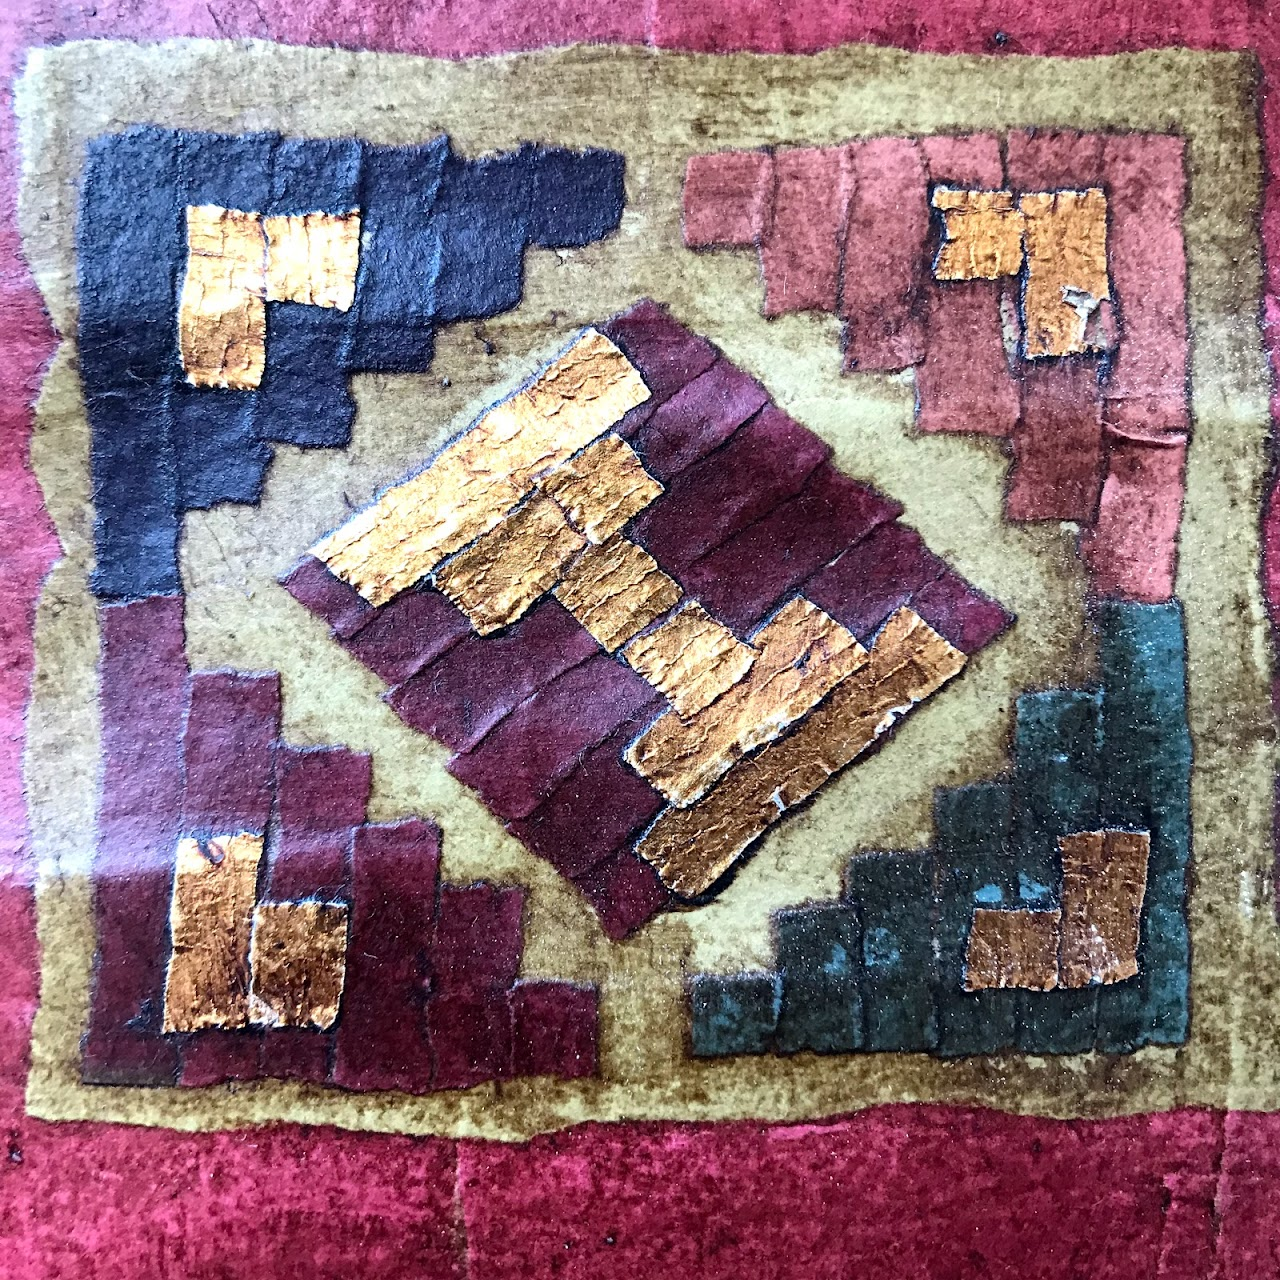 Paper Quilt Collage